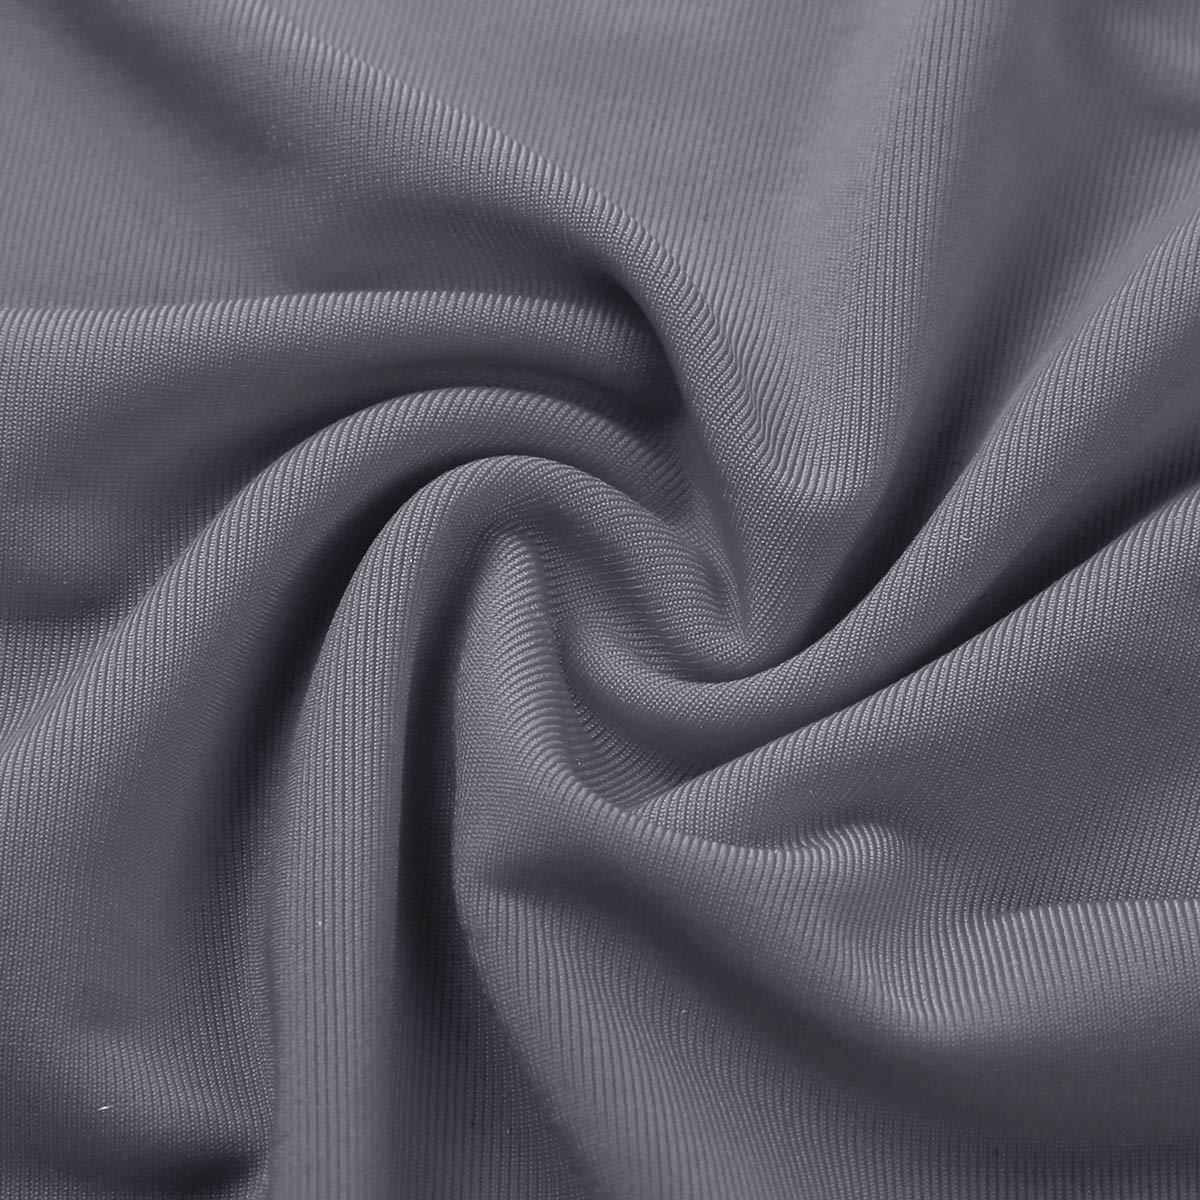 dPois Women Ultra Thin Lingerie Halter Neck Backless High Slit Legs Cheongsam Nightgown Dress